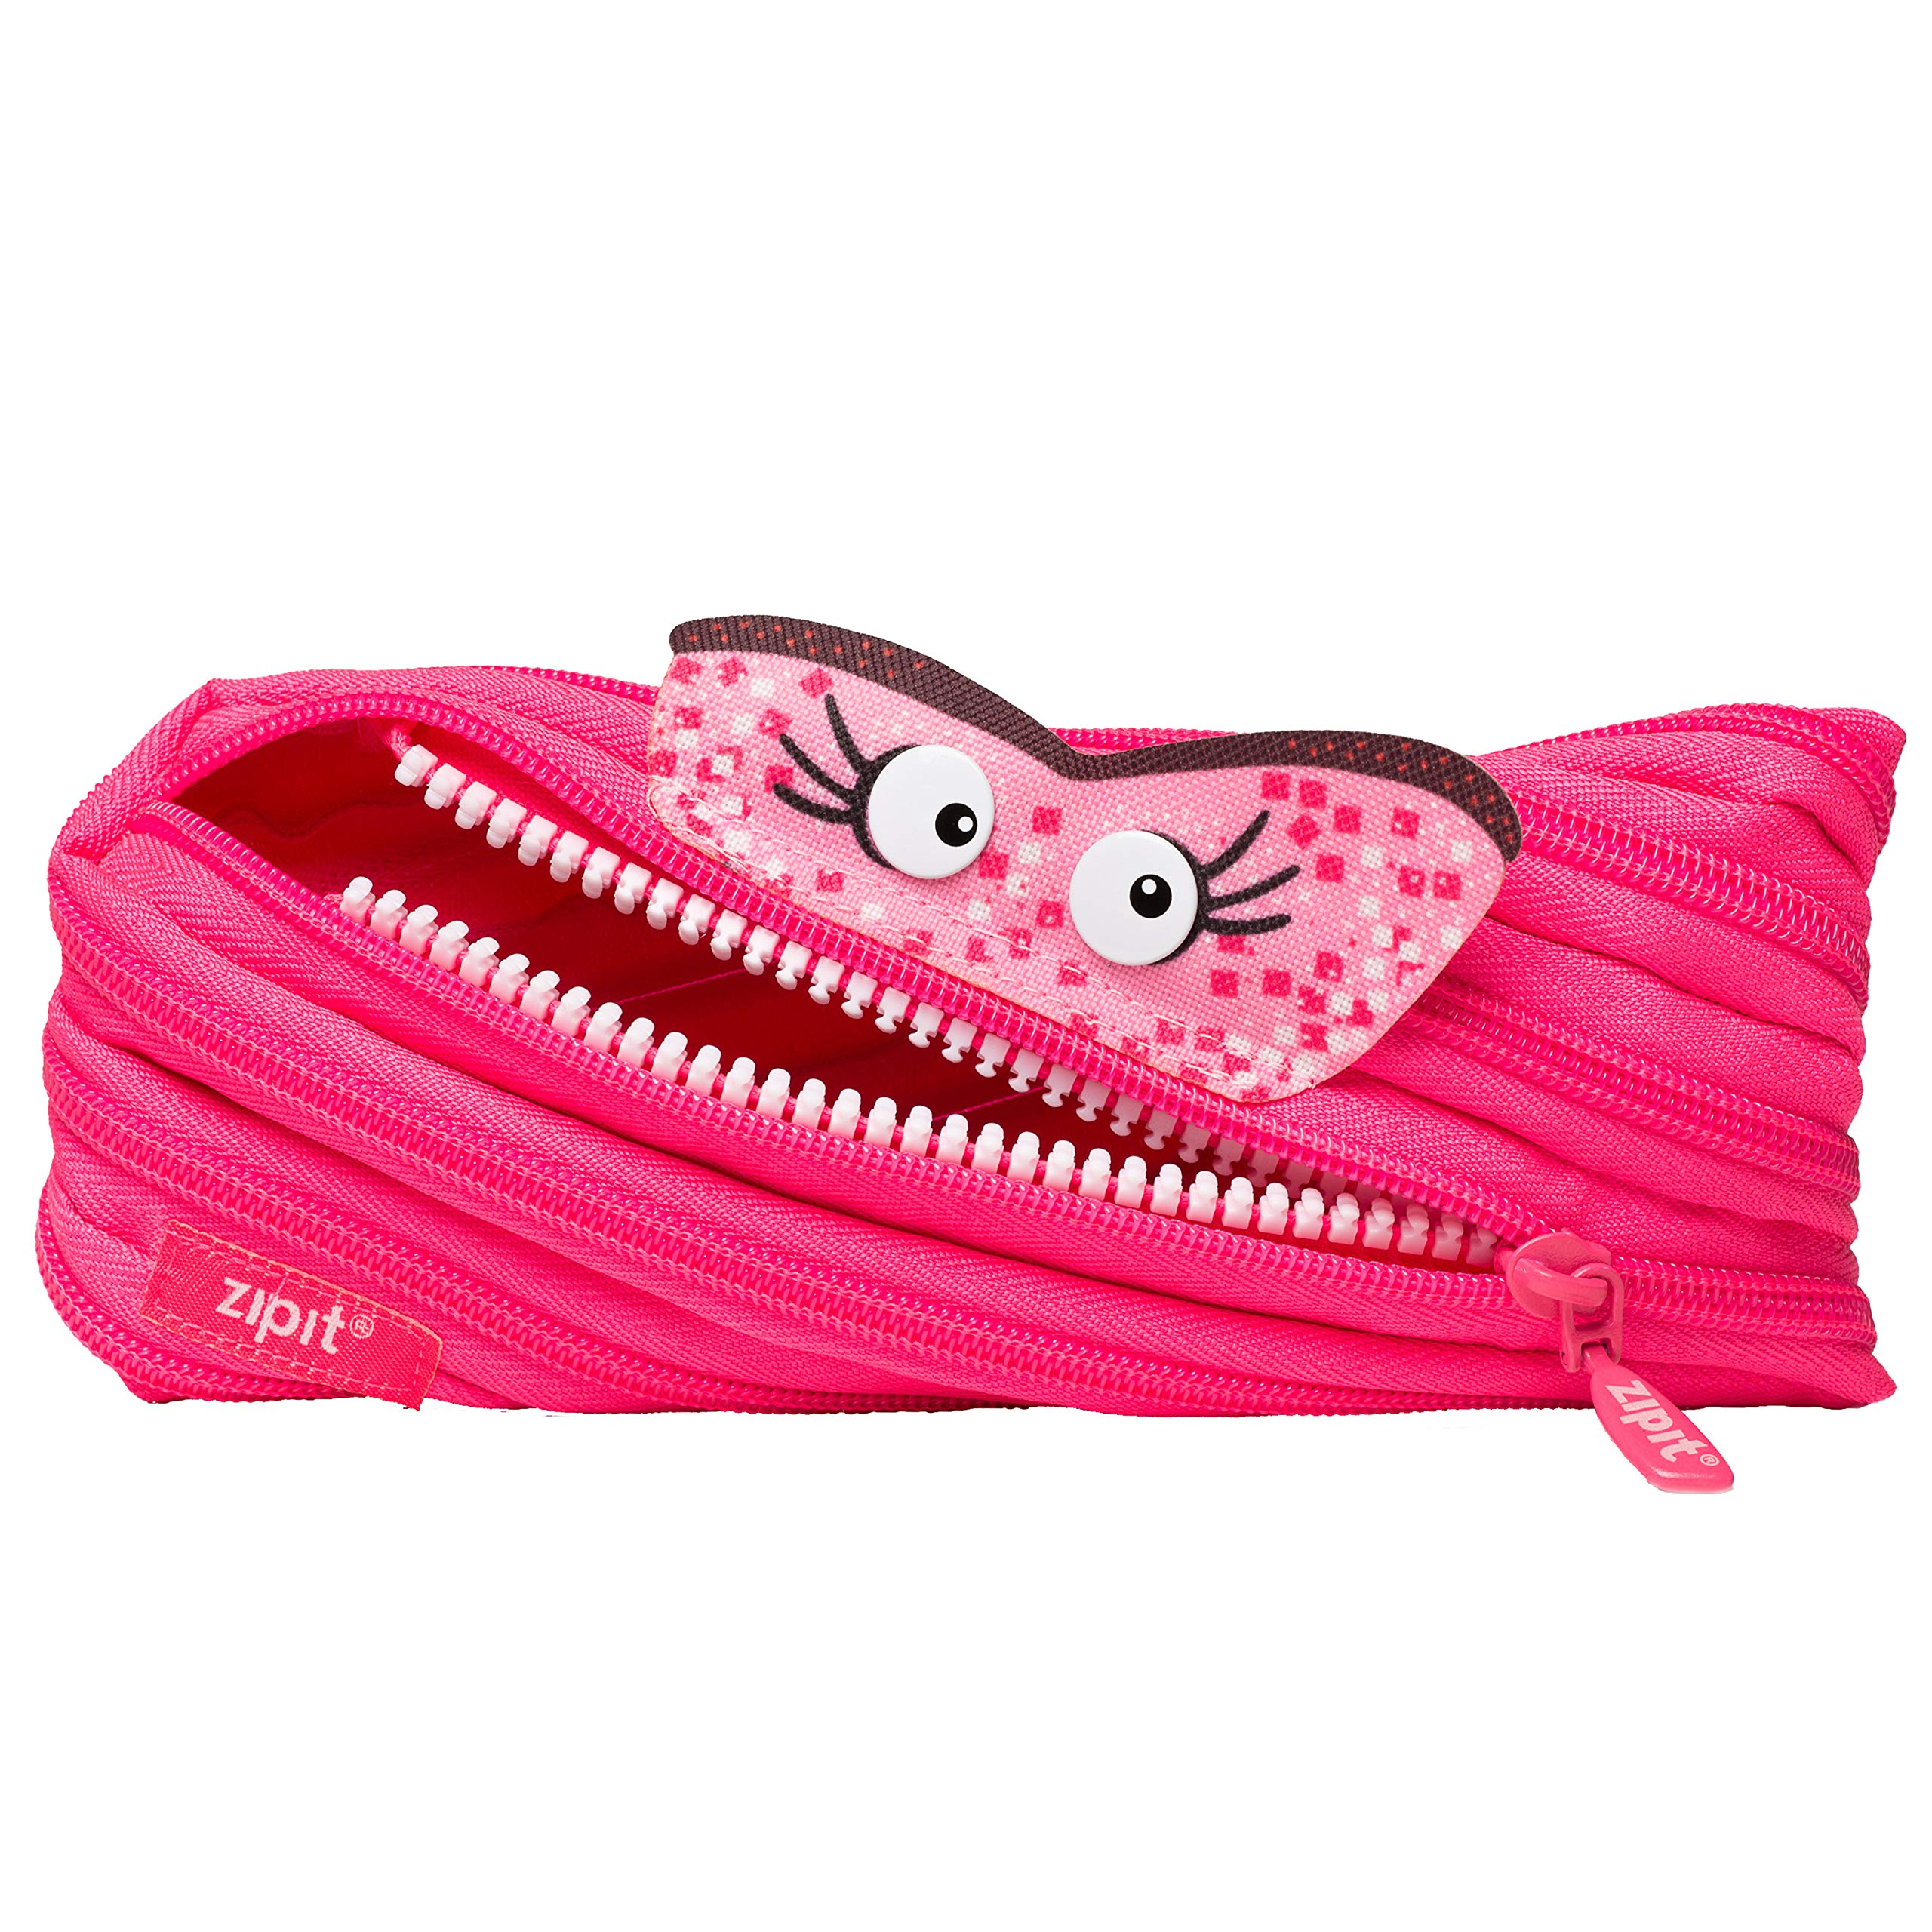 ZIPIT Talking Monstar Pencil Case, Pink